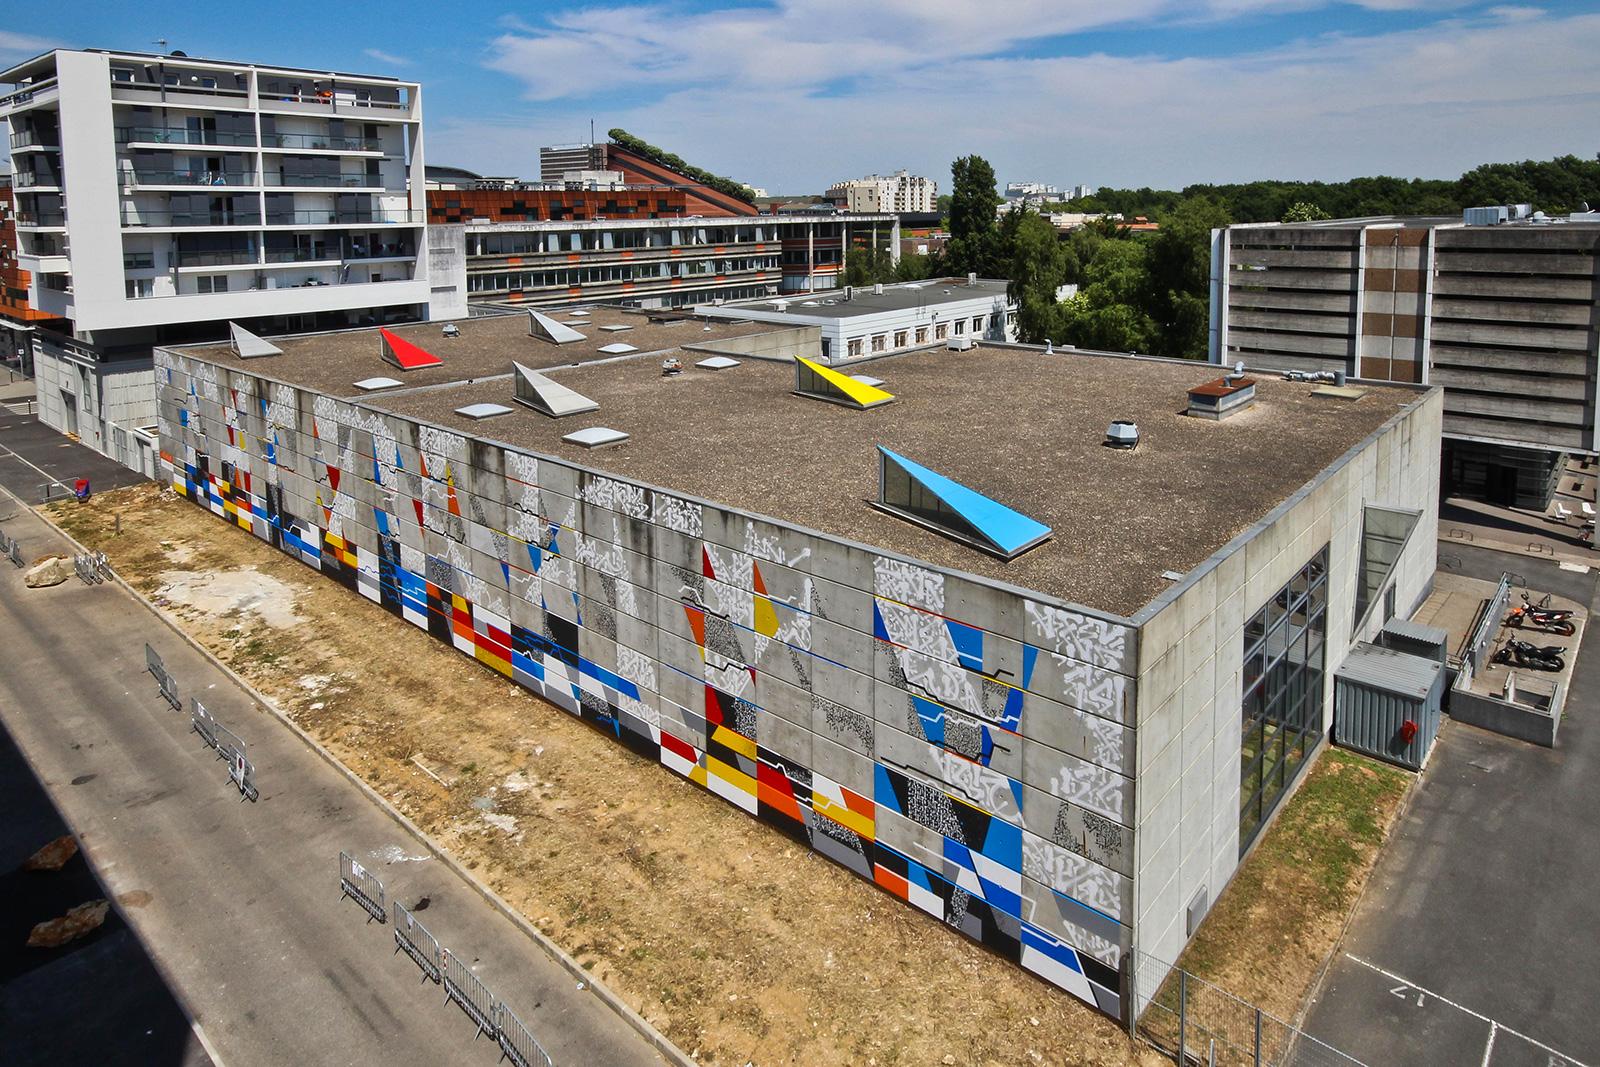 Lek-Sowat-DMV-da-mental-vaporz-graffiti-soldart-montana-bombe-spray-evry-paris-mur-peinture-nicolas-gzeley-11